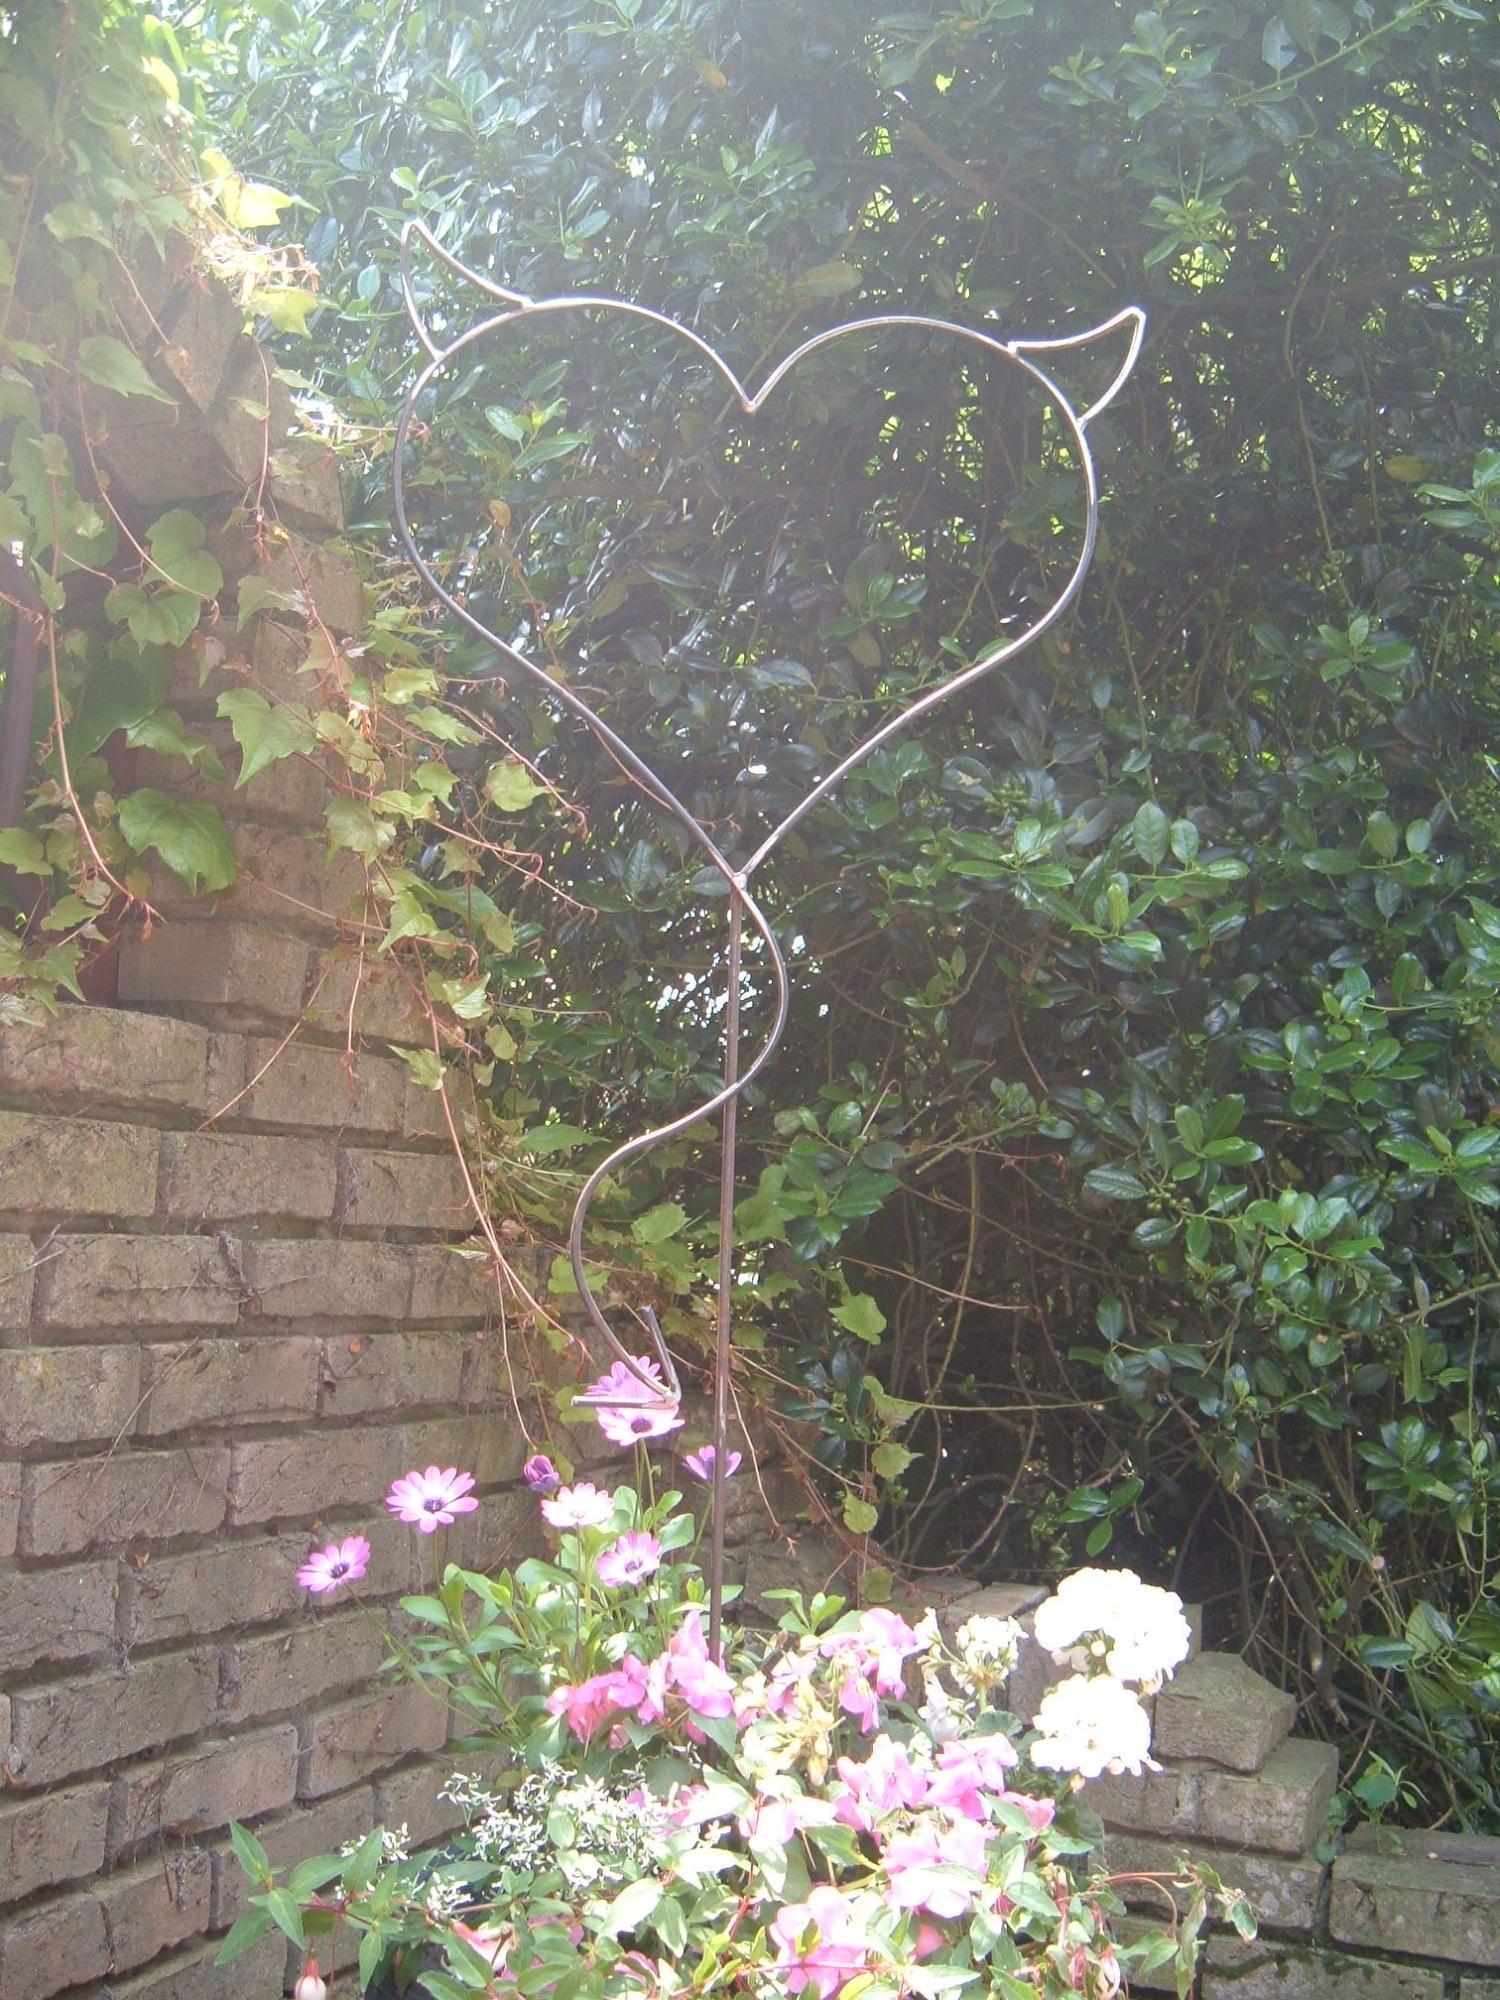 Garten balkon teufel herz devil heart herz aus for Garten herz aus metall